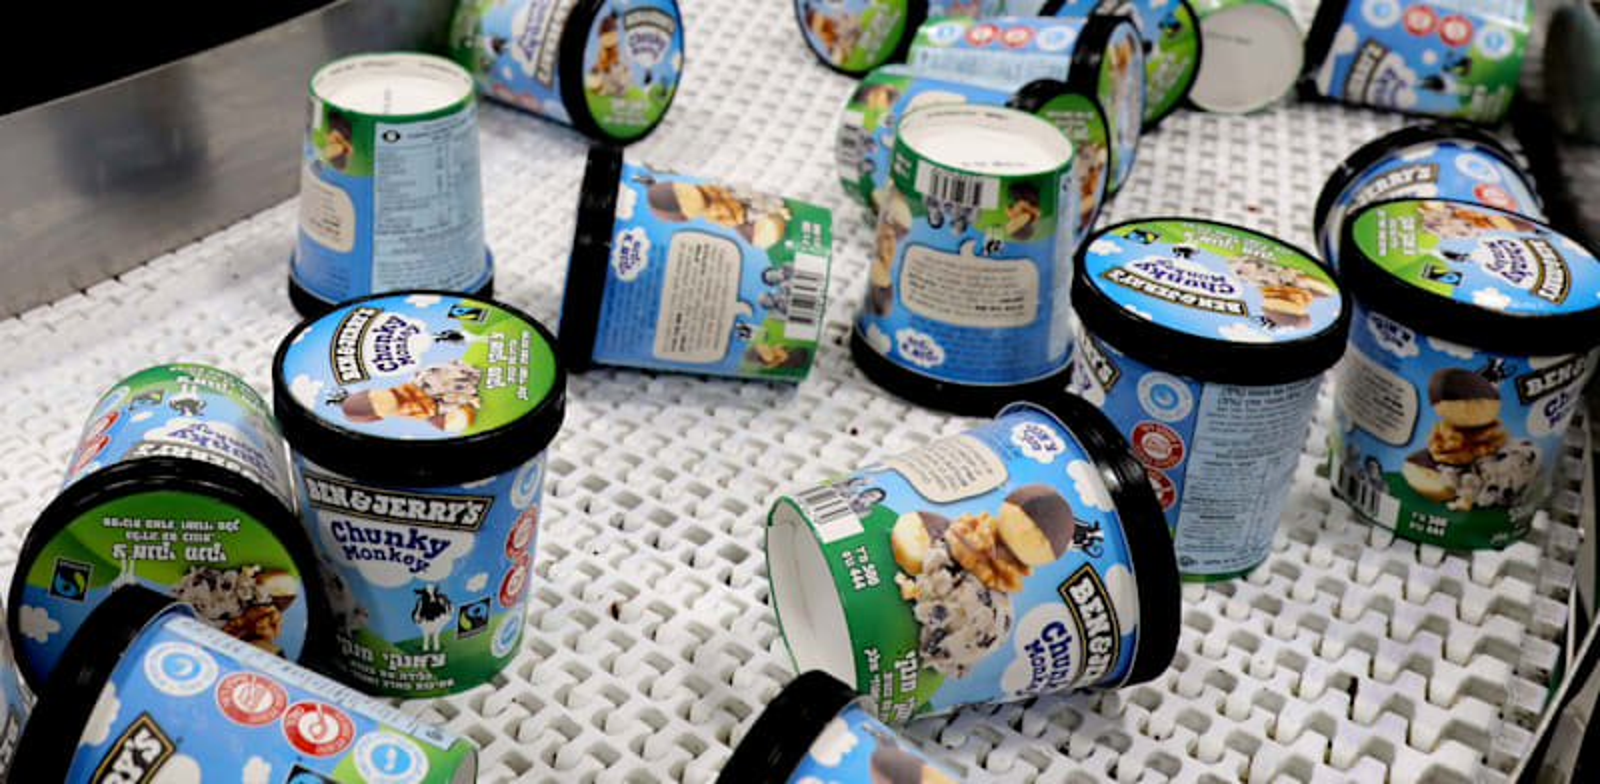 גלידות בן אנד ג'ריס / צילום: Shutterstock